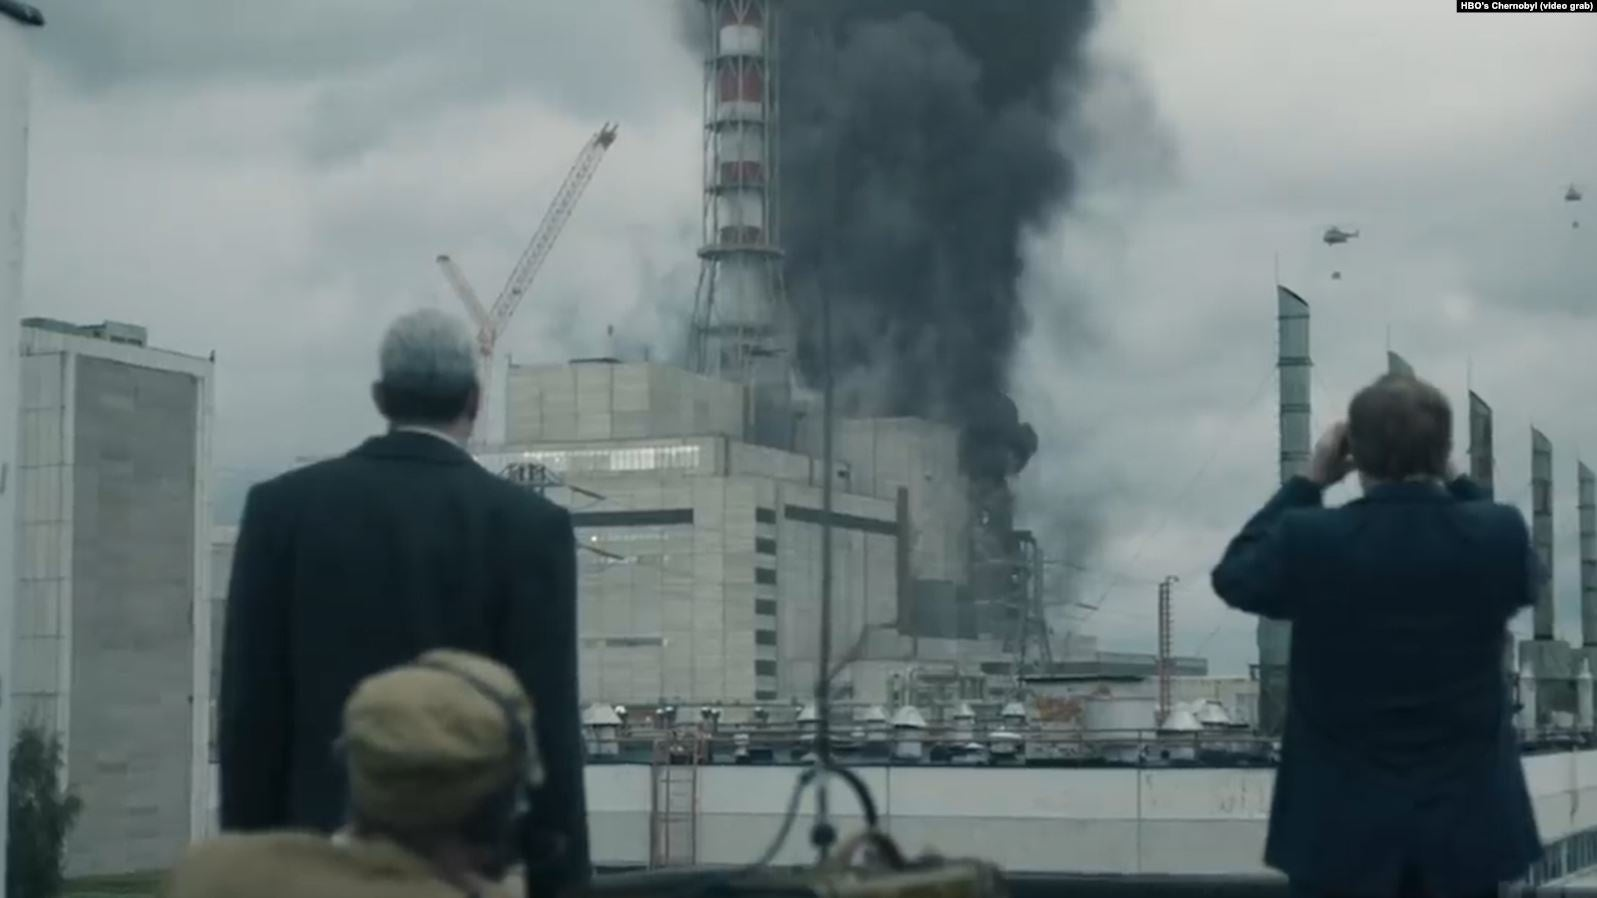 Rohani adviser shares 'Chernobyl' love, awaits fallout